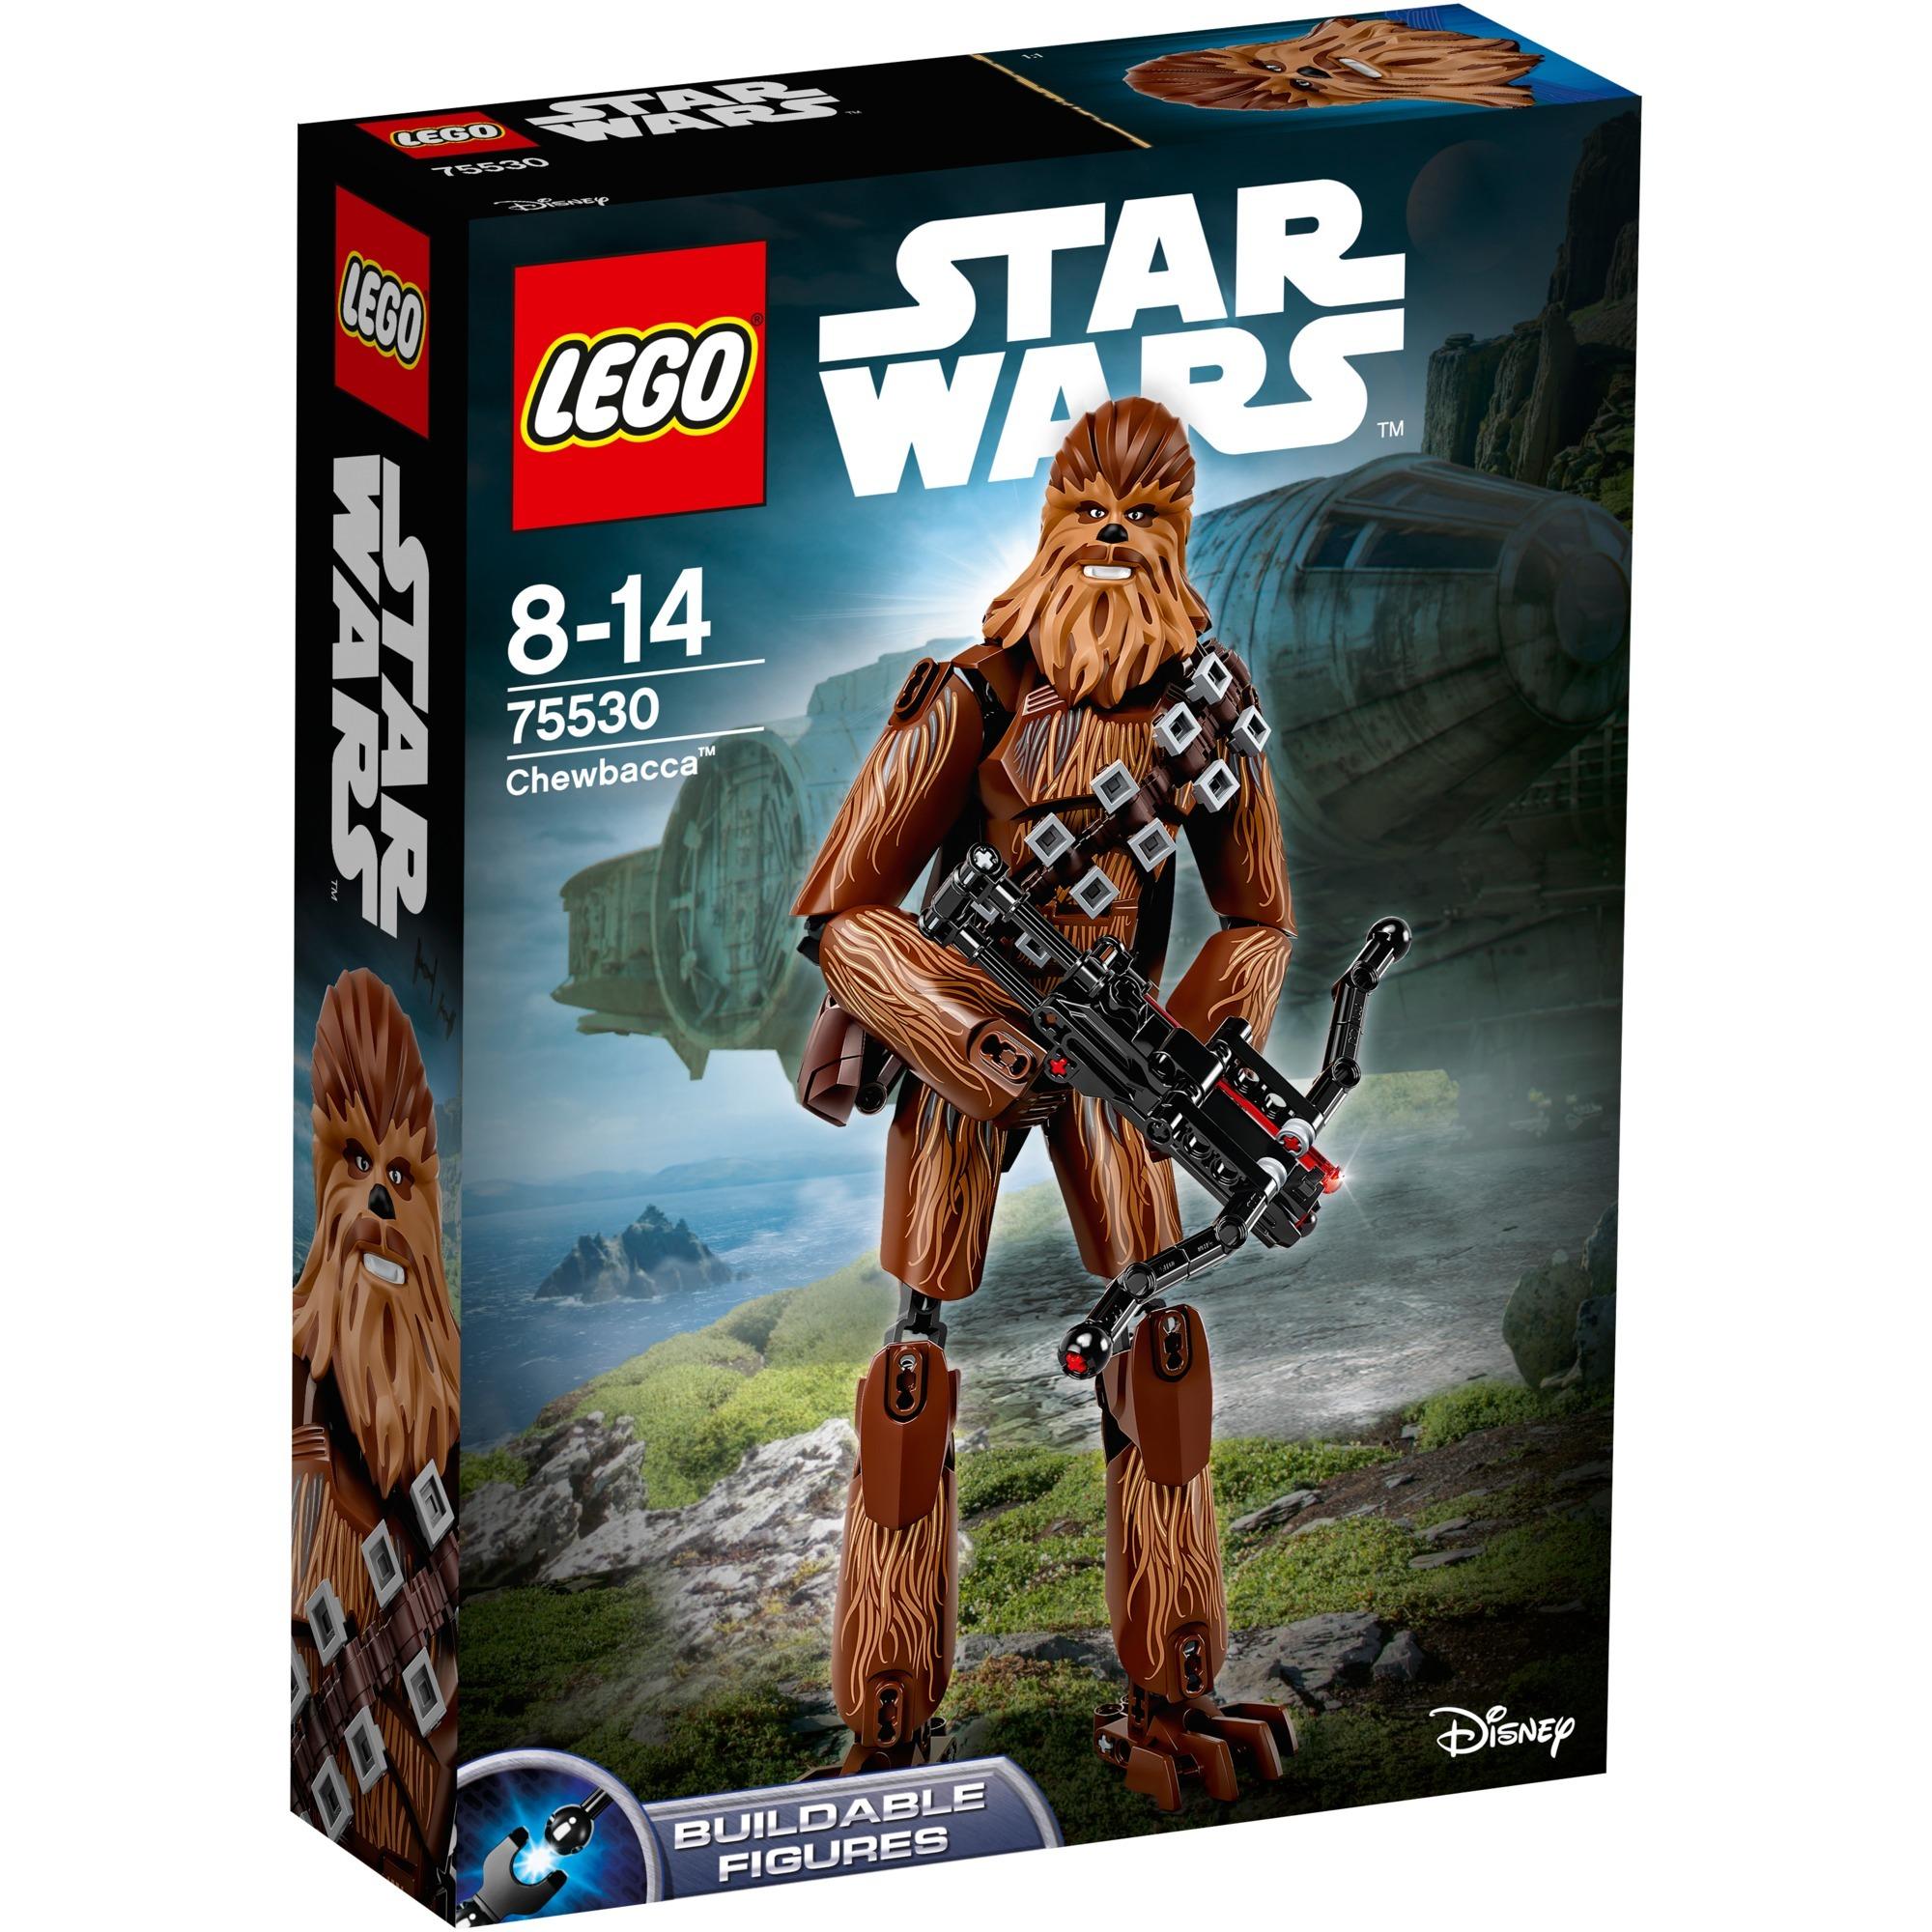 Star Wars - Chewbacca, Jouets de construction